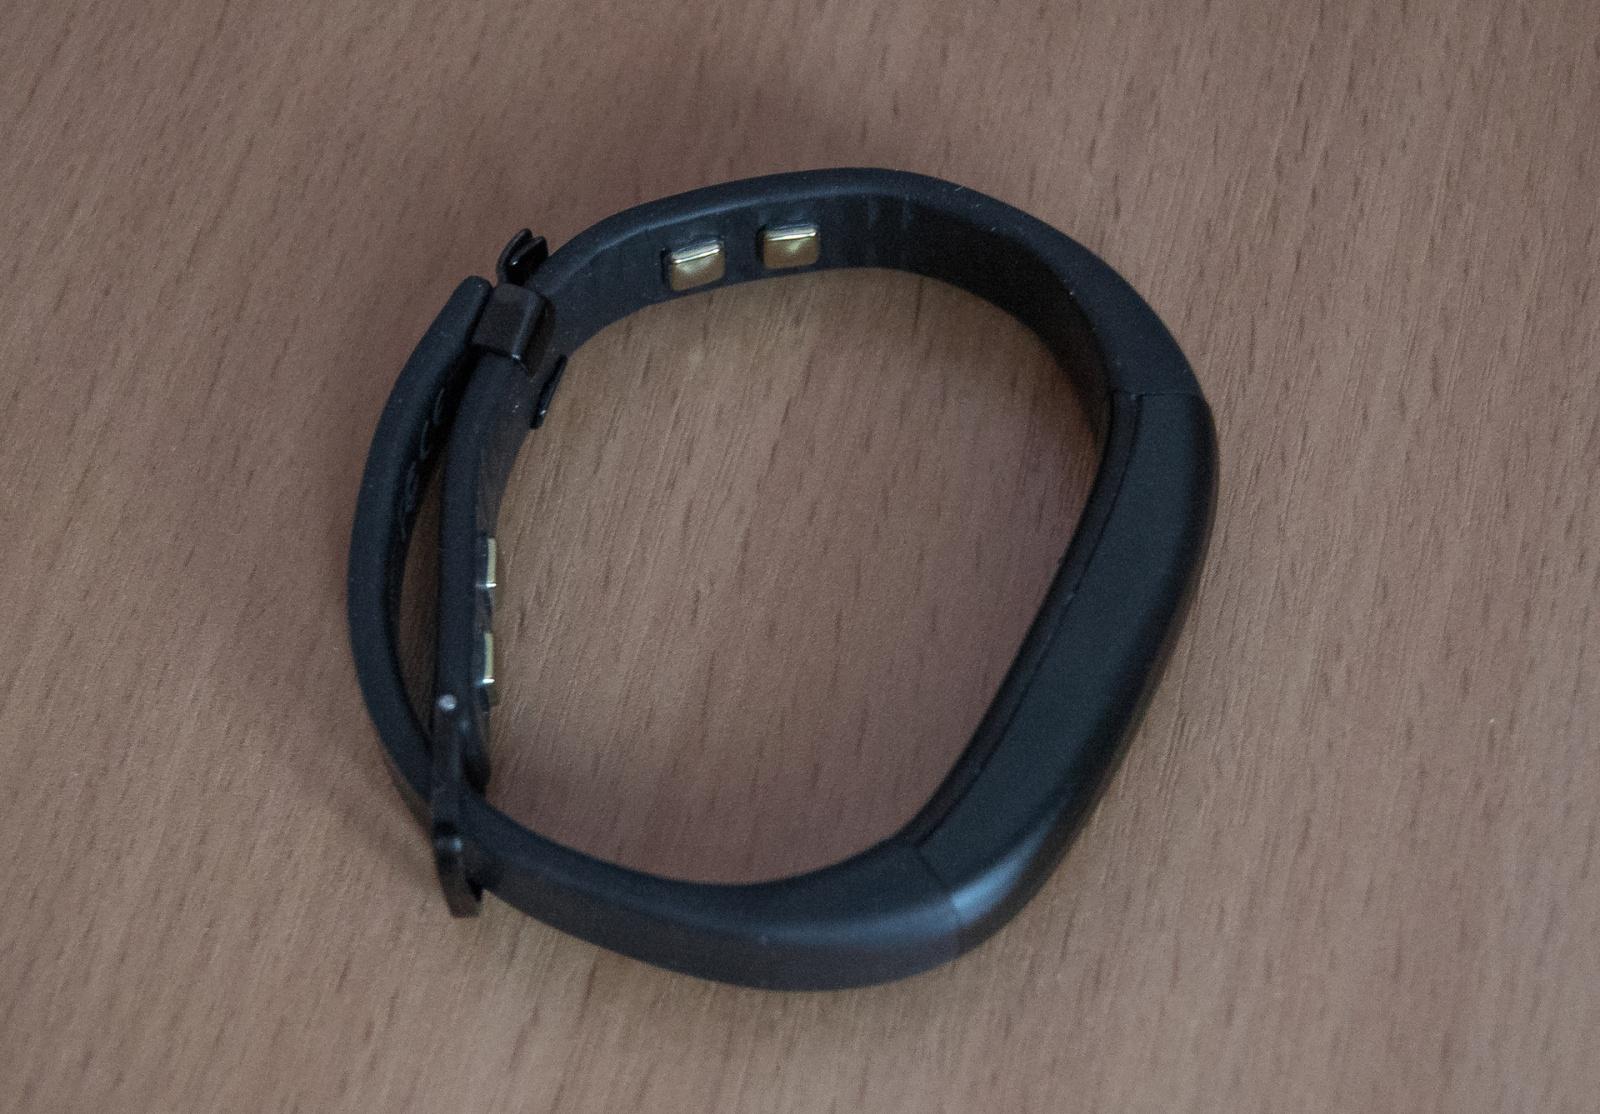 Спорт-семейство: Jawbone UP3 и UP2 с позабытым товарищем UP24 - 11